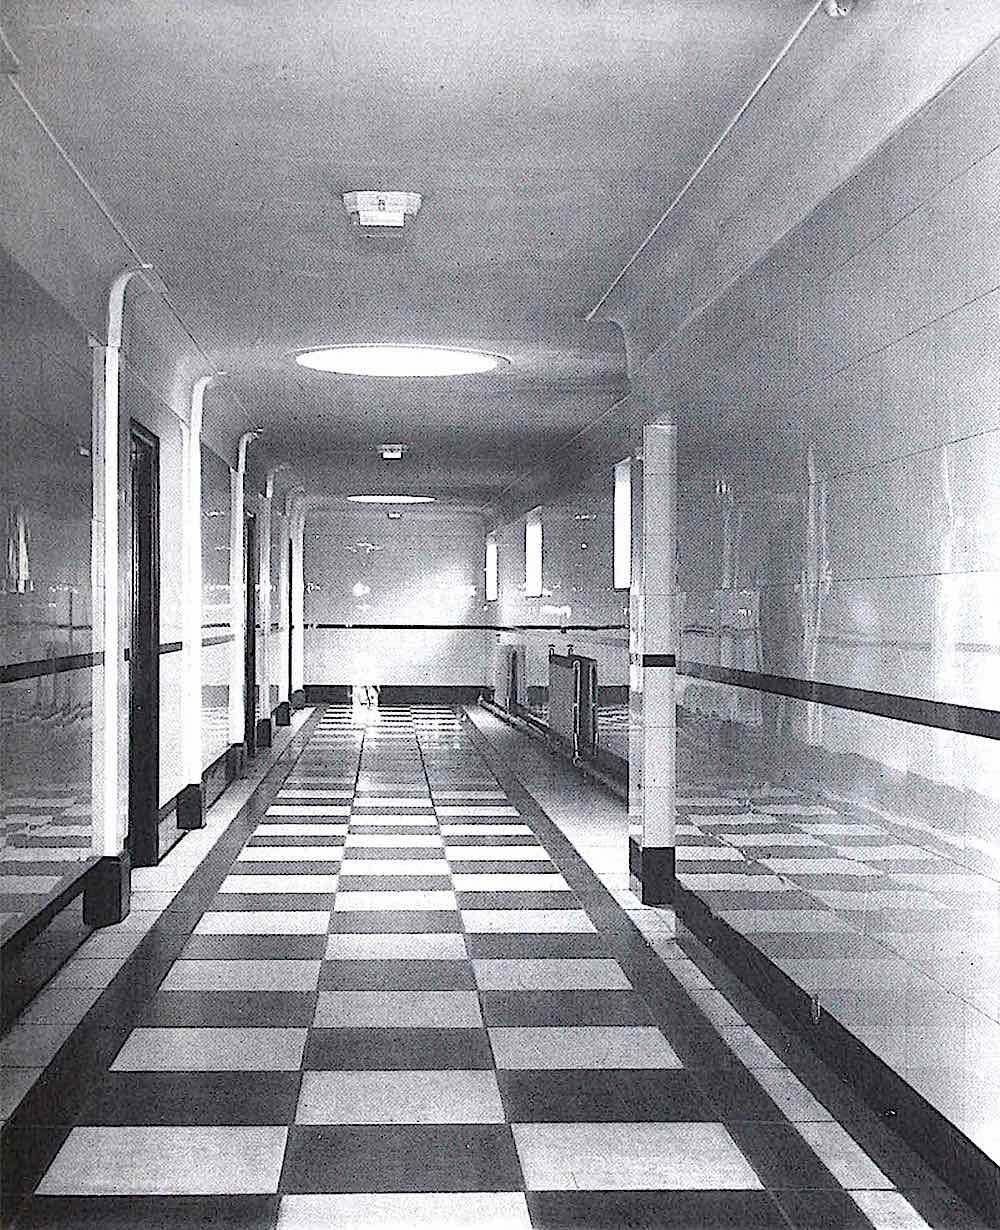 Vitrolite tiles in a 1930s office, reverberate